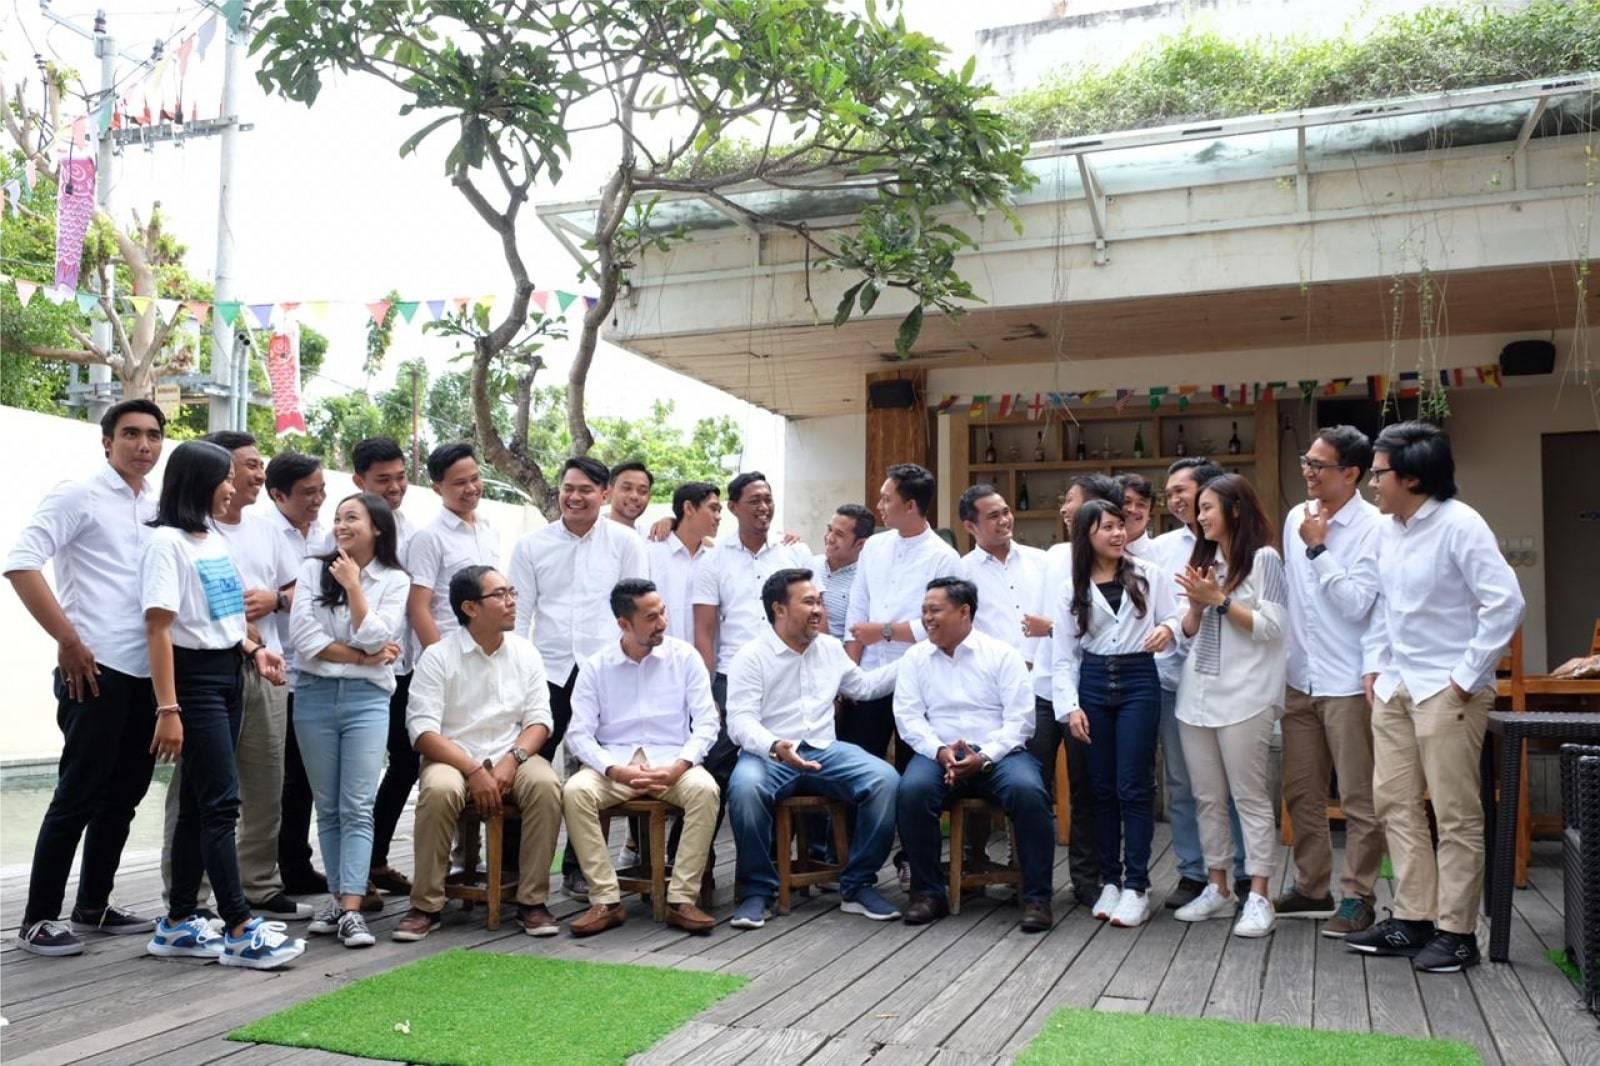 Bali Emporio Architect Team Performs Photo Together at Ayucious, Denpasar 7